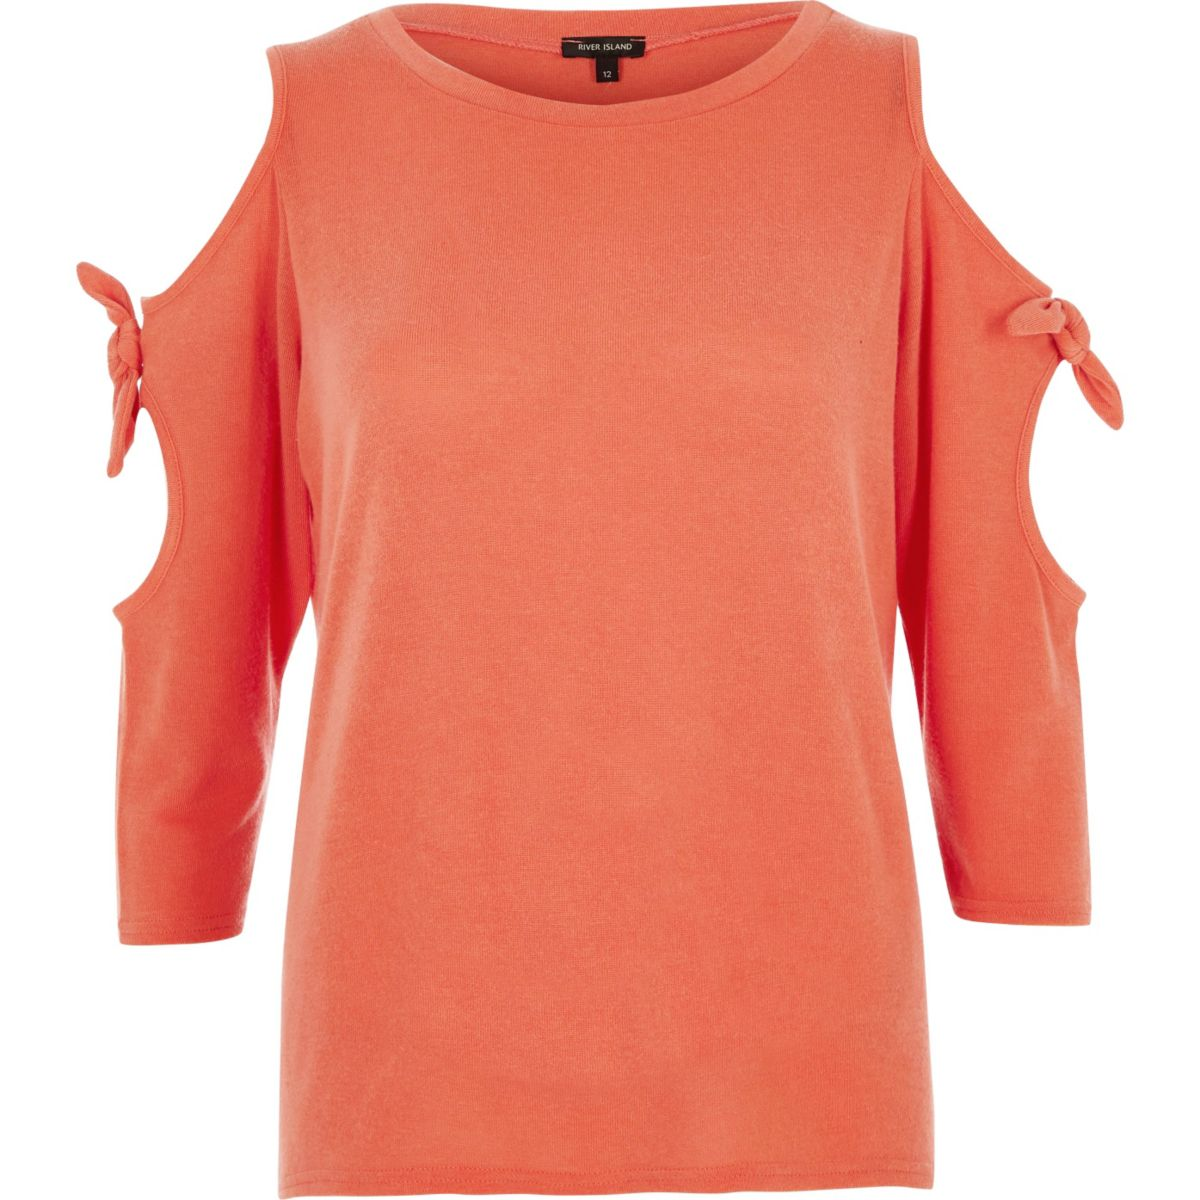 Orange tie sleeve cold shoulder top